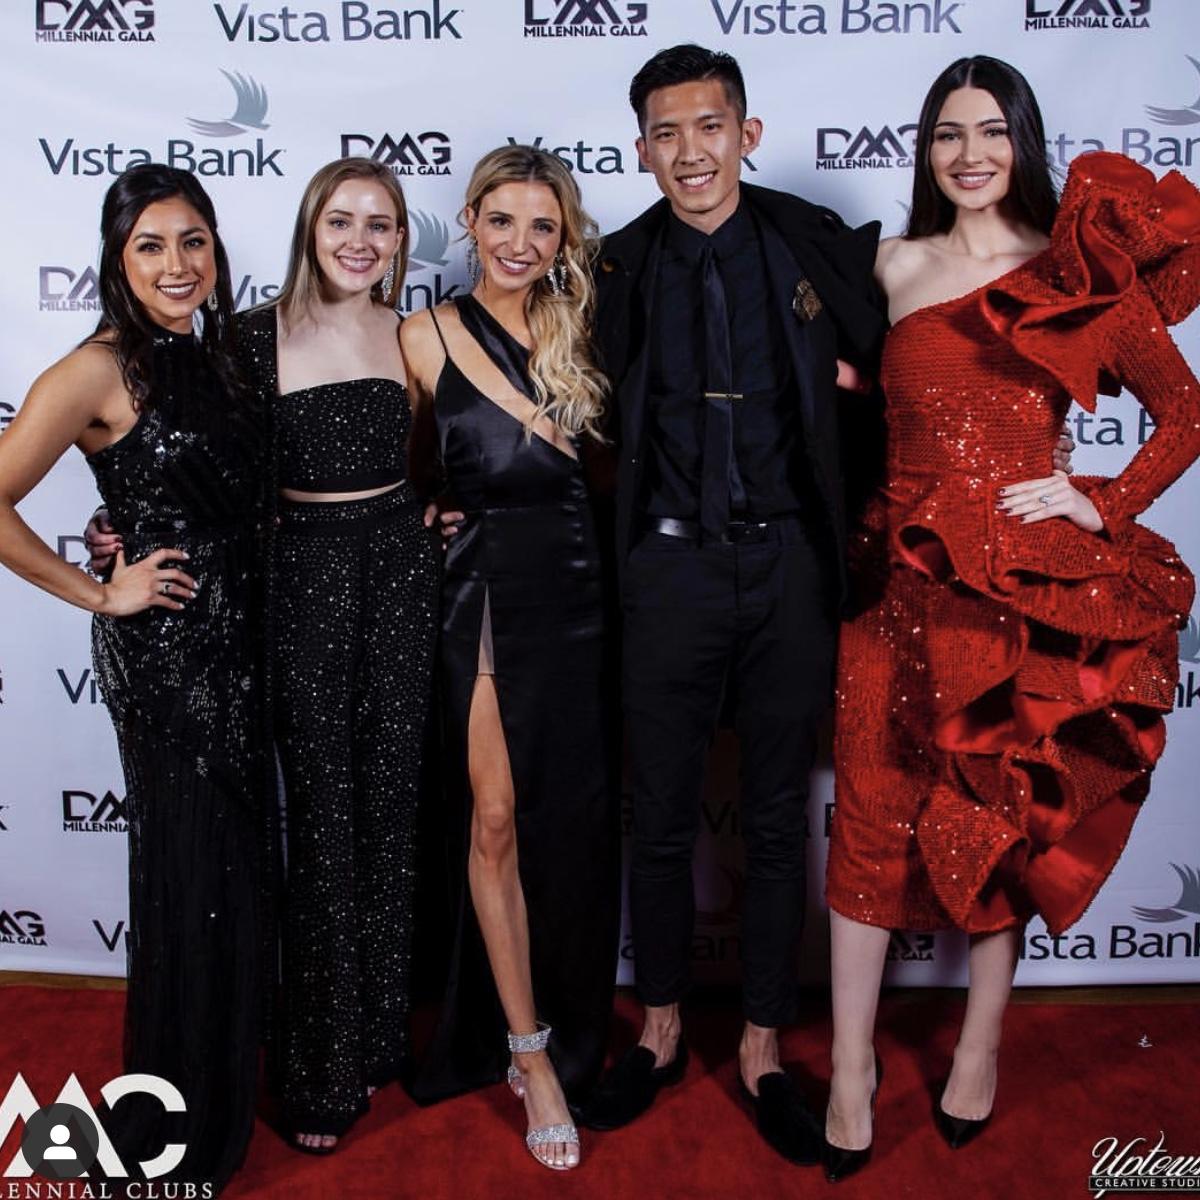 DMC Millennial Gala 2018